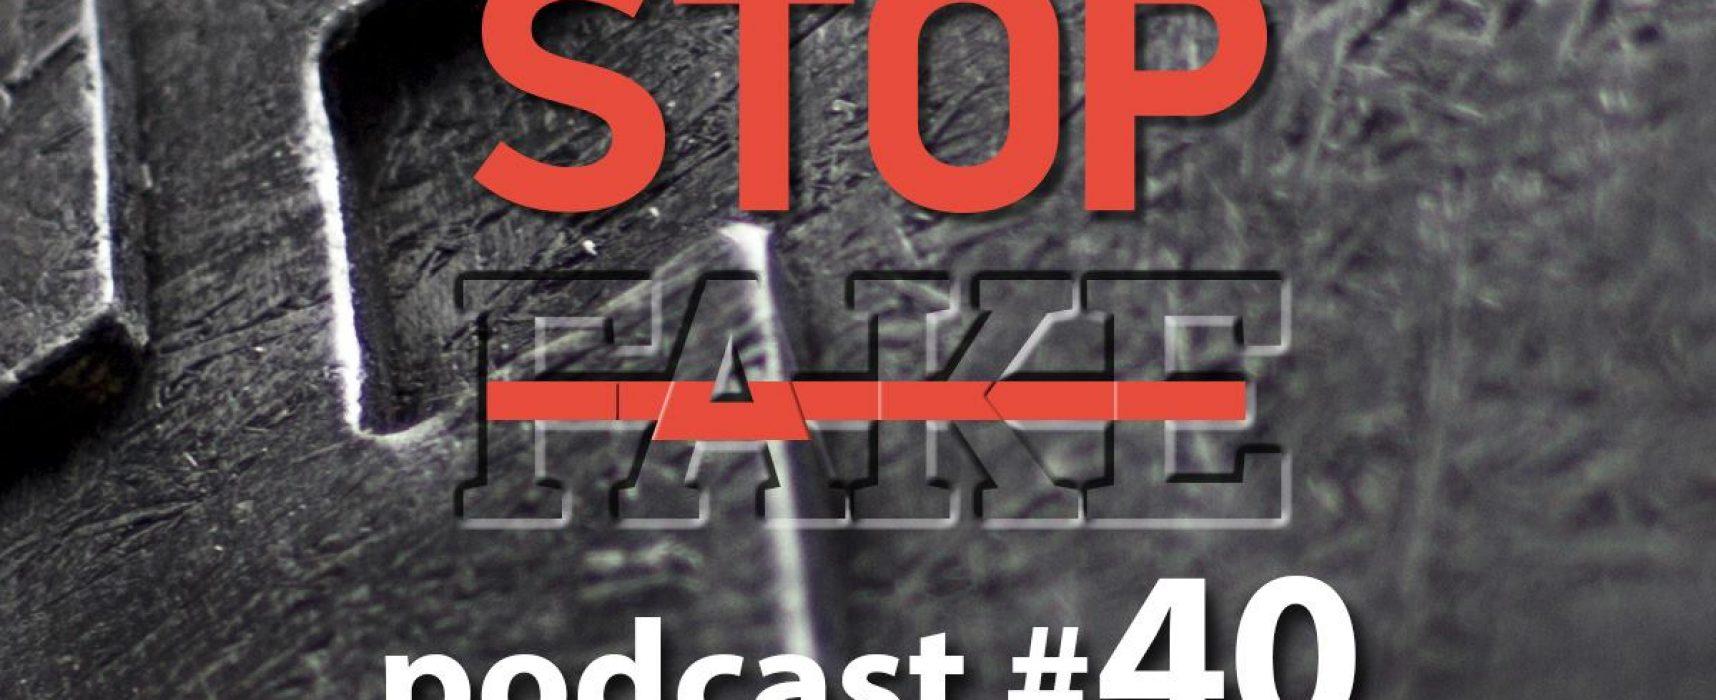 StopFake podcast #40